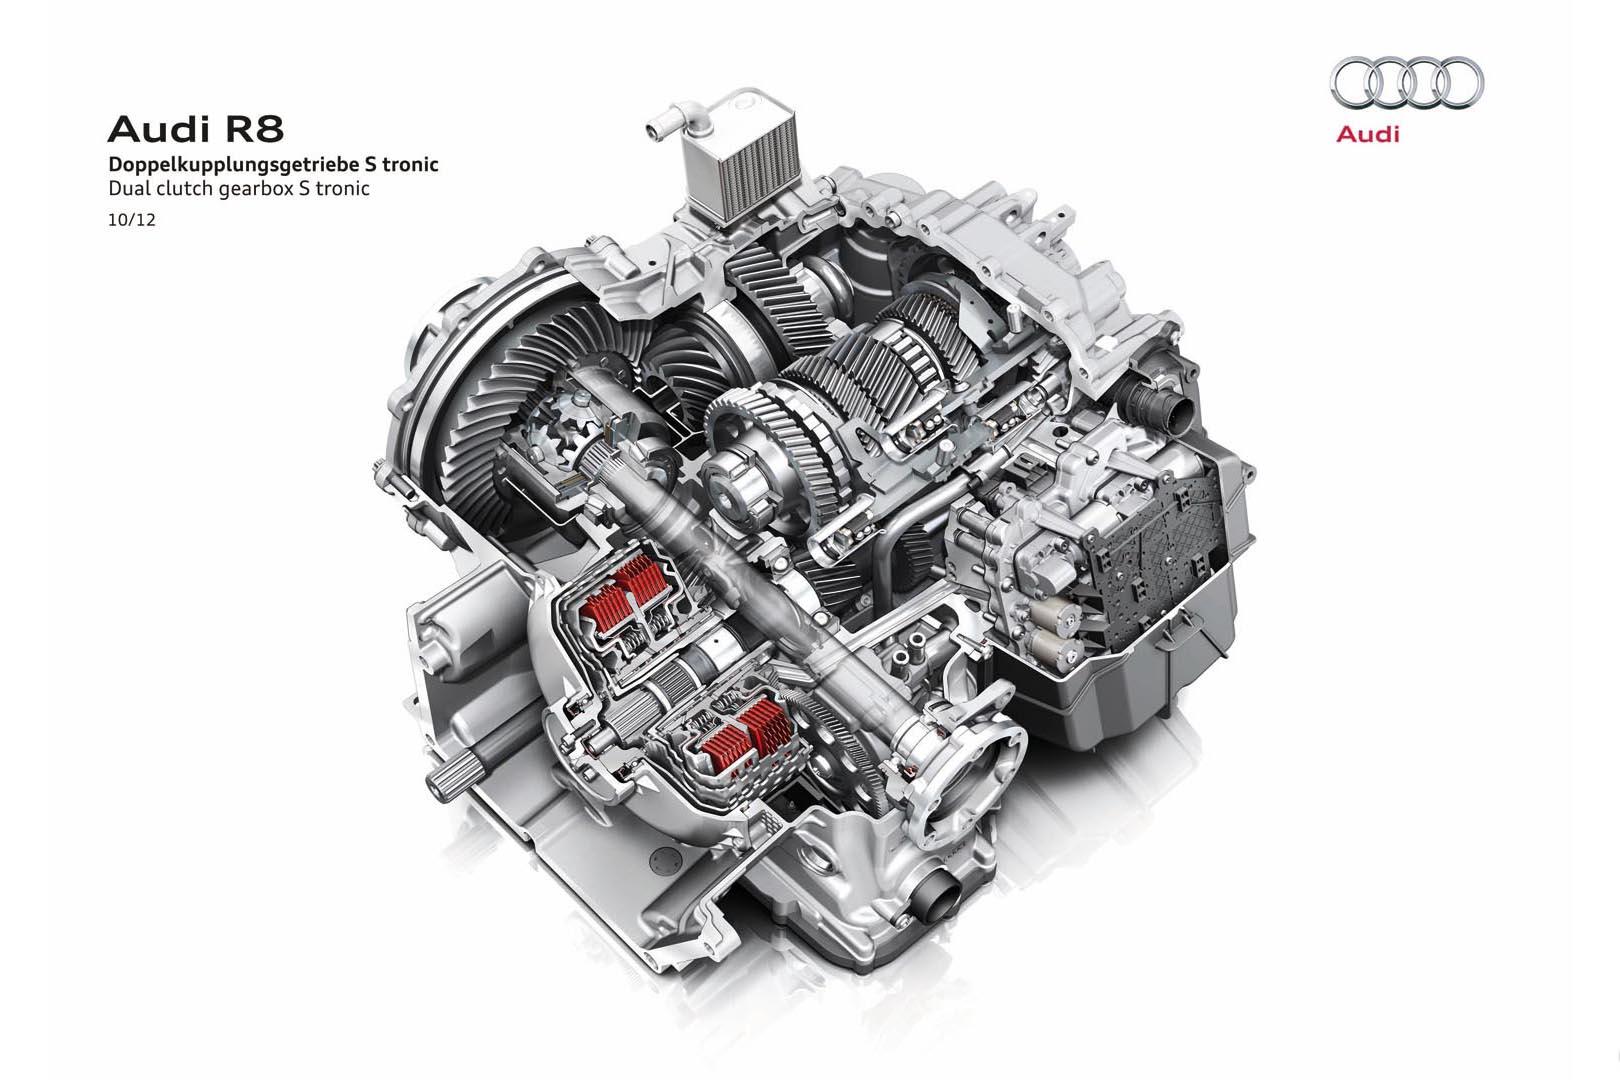 Audi R8 Engine Diagram Change Your Idea With Wiring Design D2 Spyder Library Rh 24 Seo Memo De Manual A6